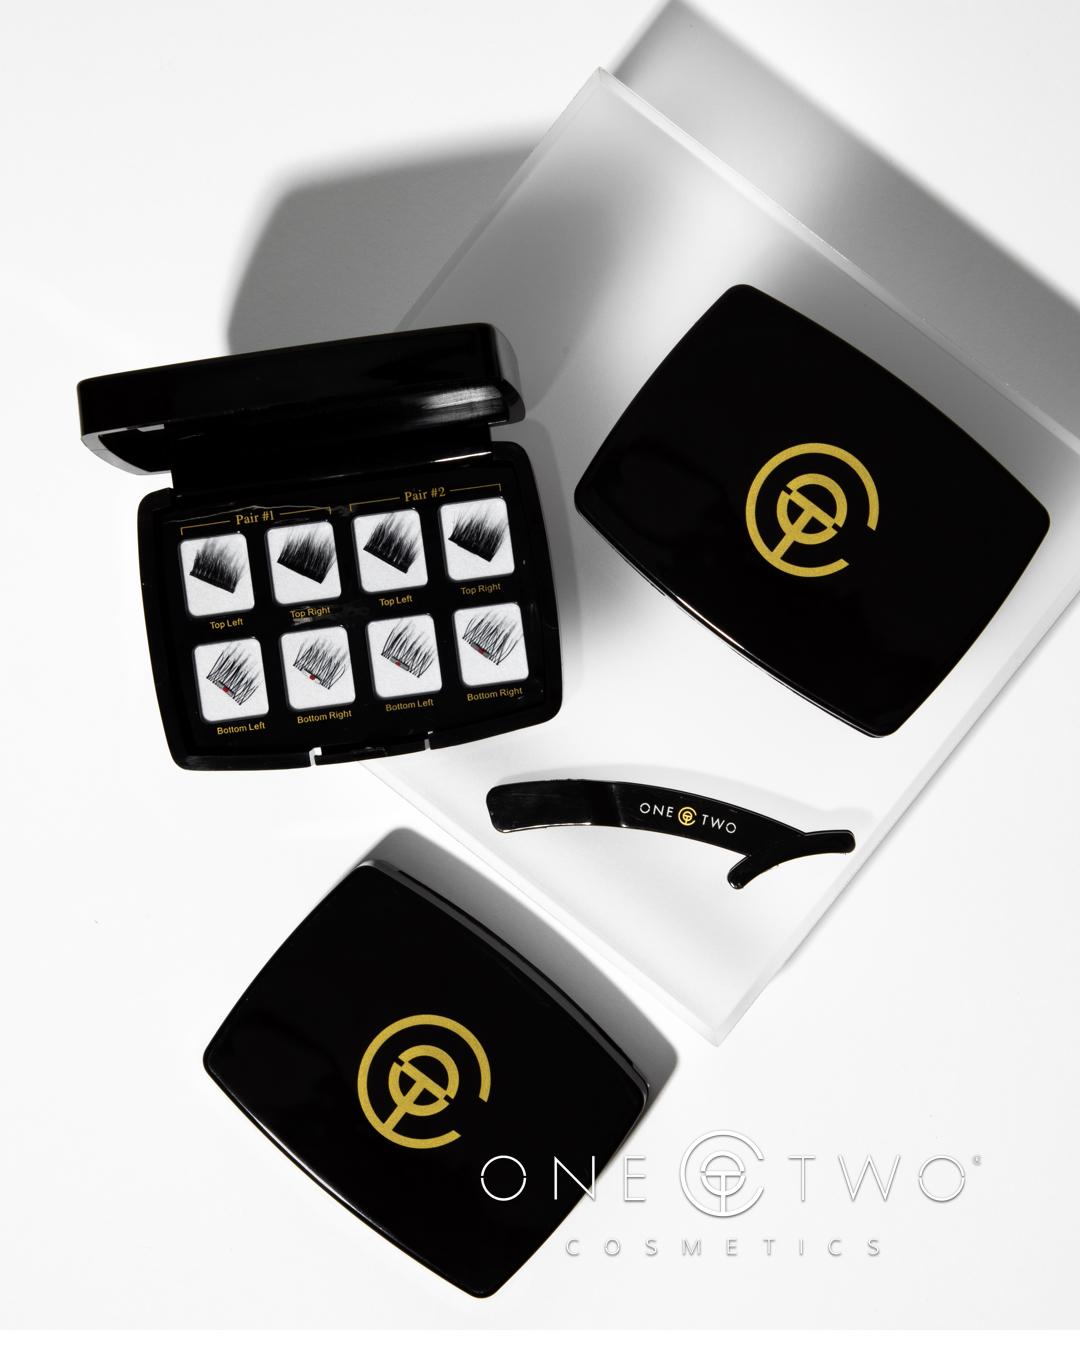 One_Two_Cosmetics_West Headshots.001.jpeg